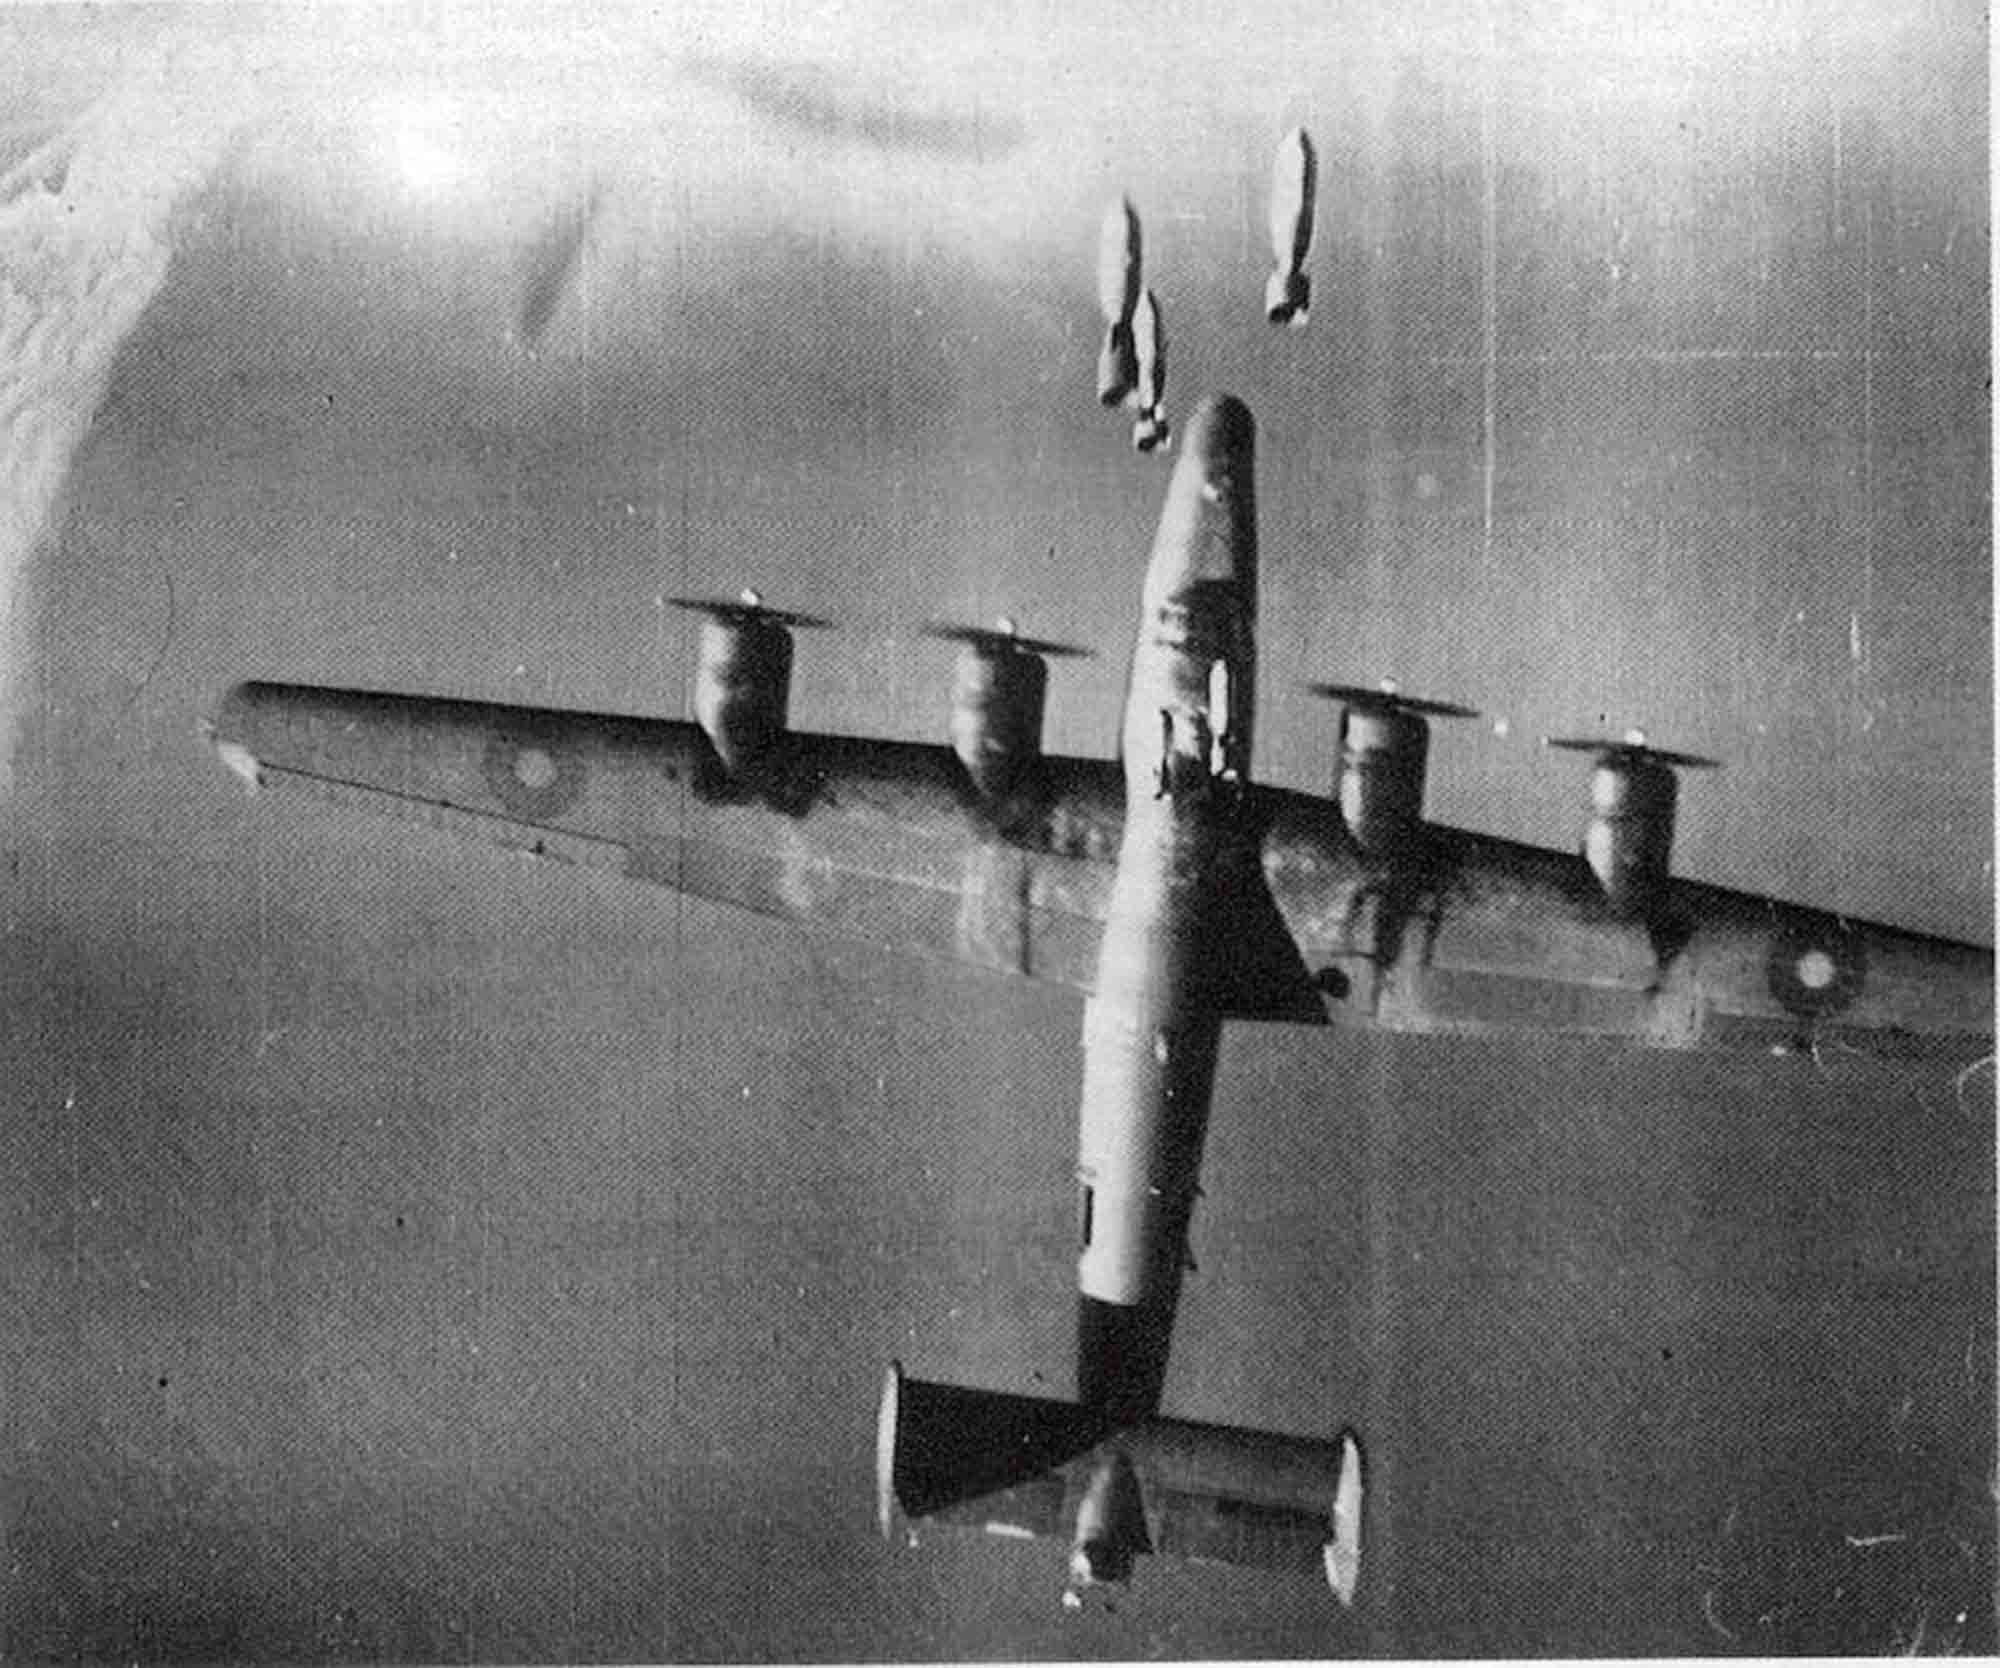 B 24 liberator bomber